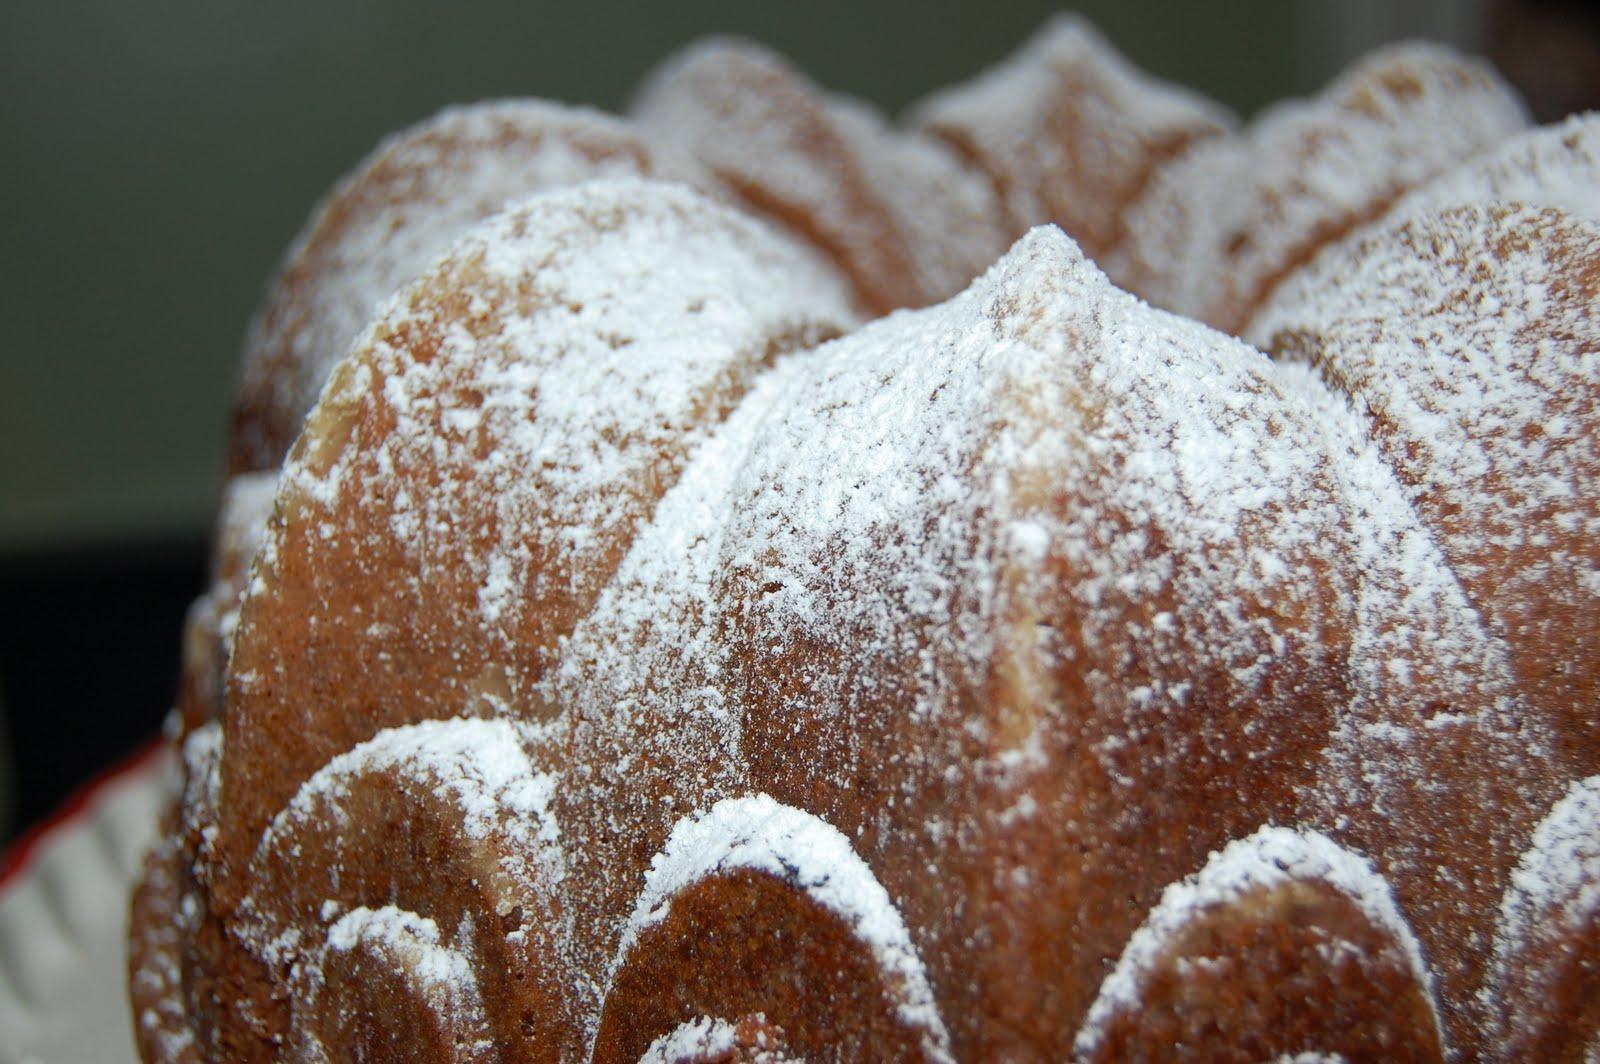 KnitOne,PearlOnion: Cardamom Vanilla Pound Cake